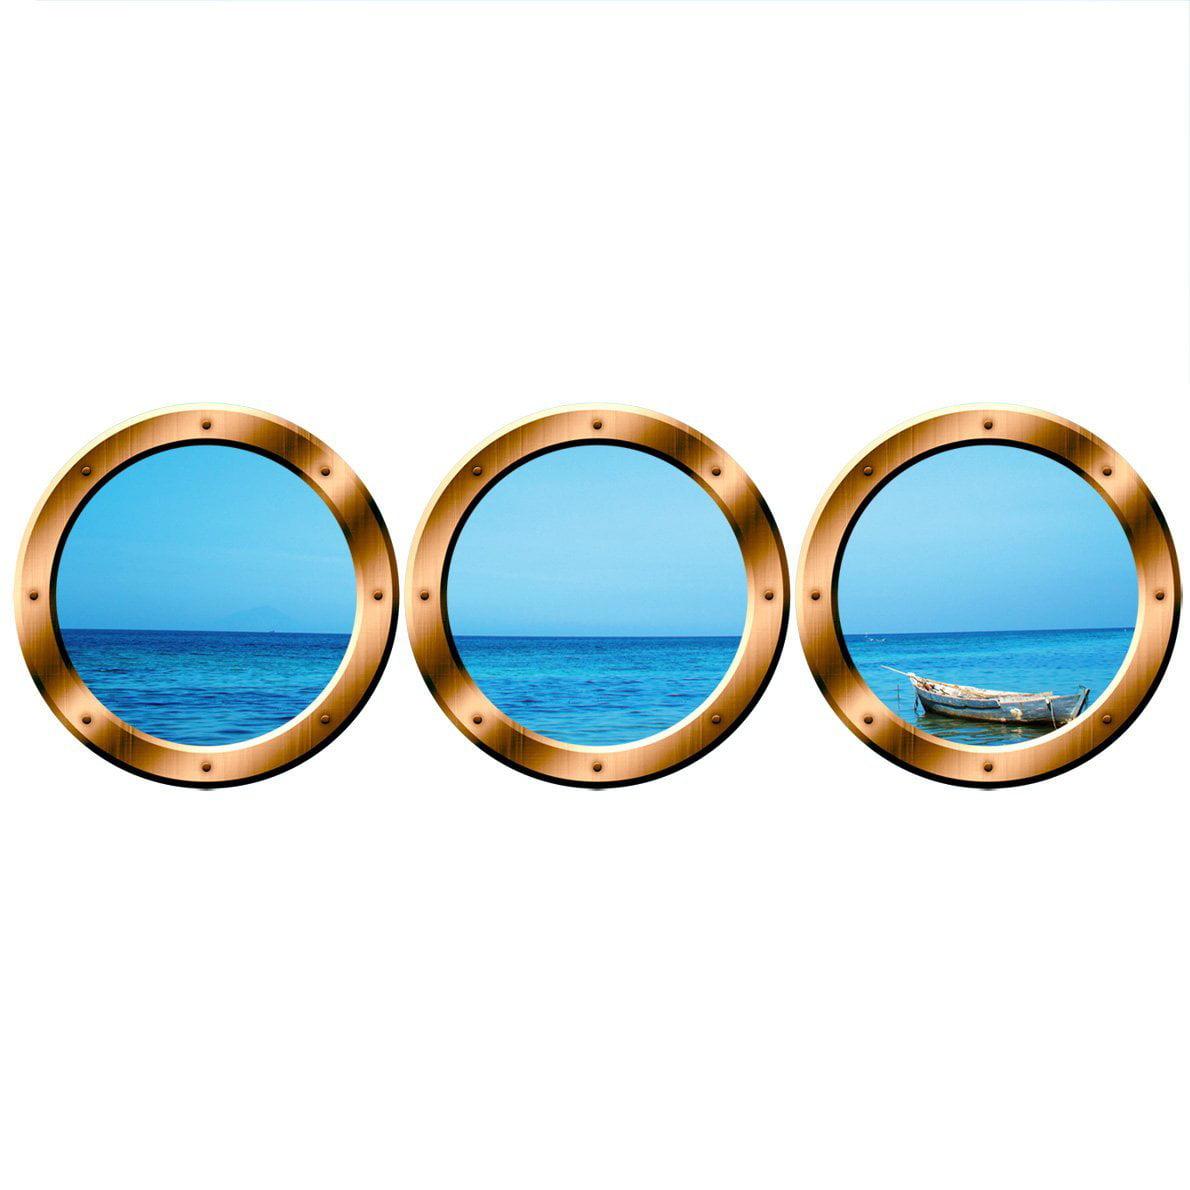 "VWAQ Wall Decal Stickers - Ocean Portholes Decals - Submarine Window VWAQ-SPW1 (24"" Diameter, Bronze)"